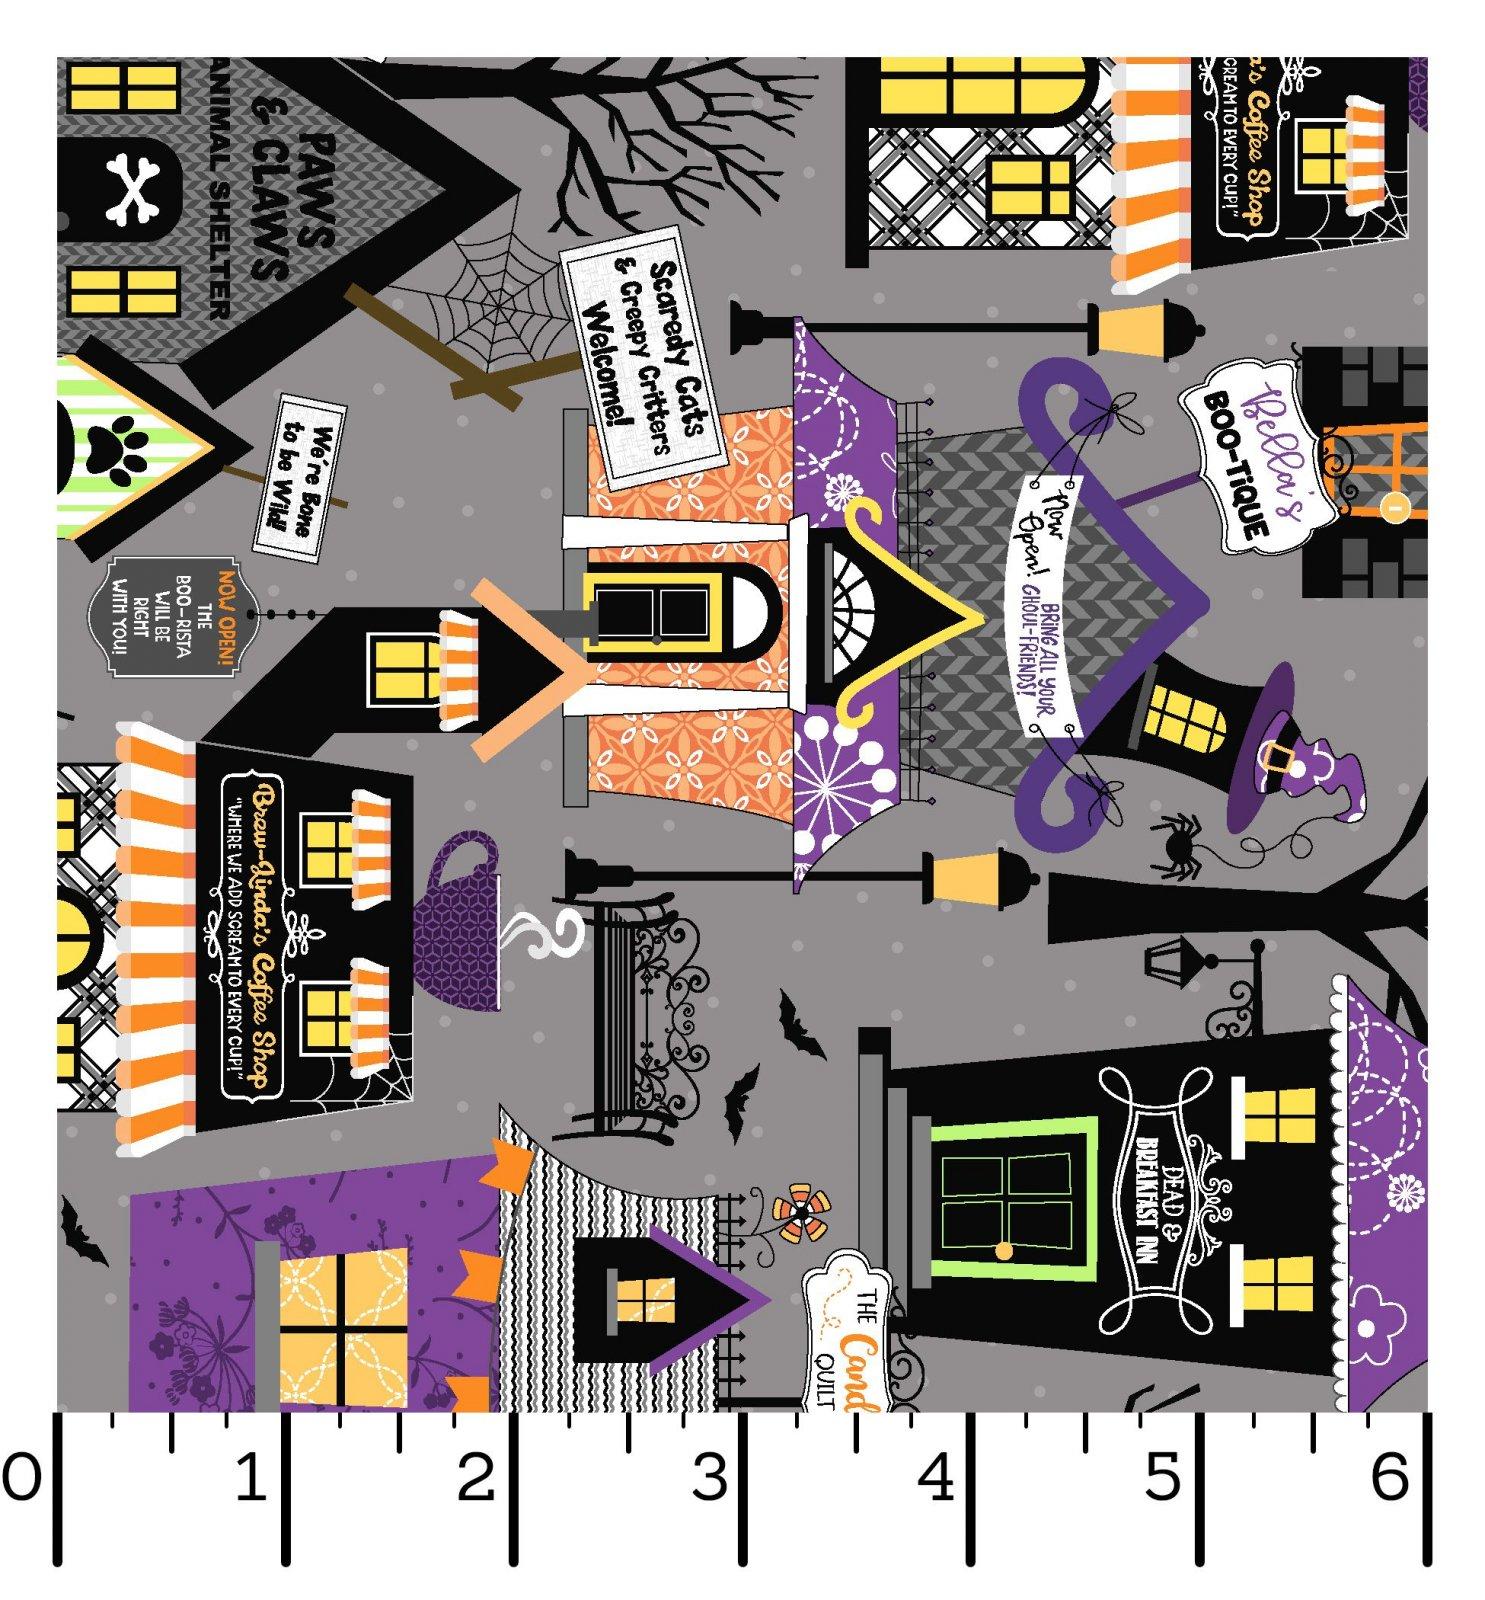 EESC-9920 K - HOMETOWN HALLOWEEN BY KIMBERBELL HOMETOWN HOUSES GREY - ARRIVING IN JULY 2021